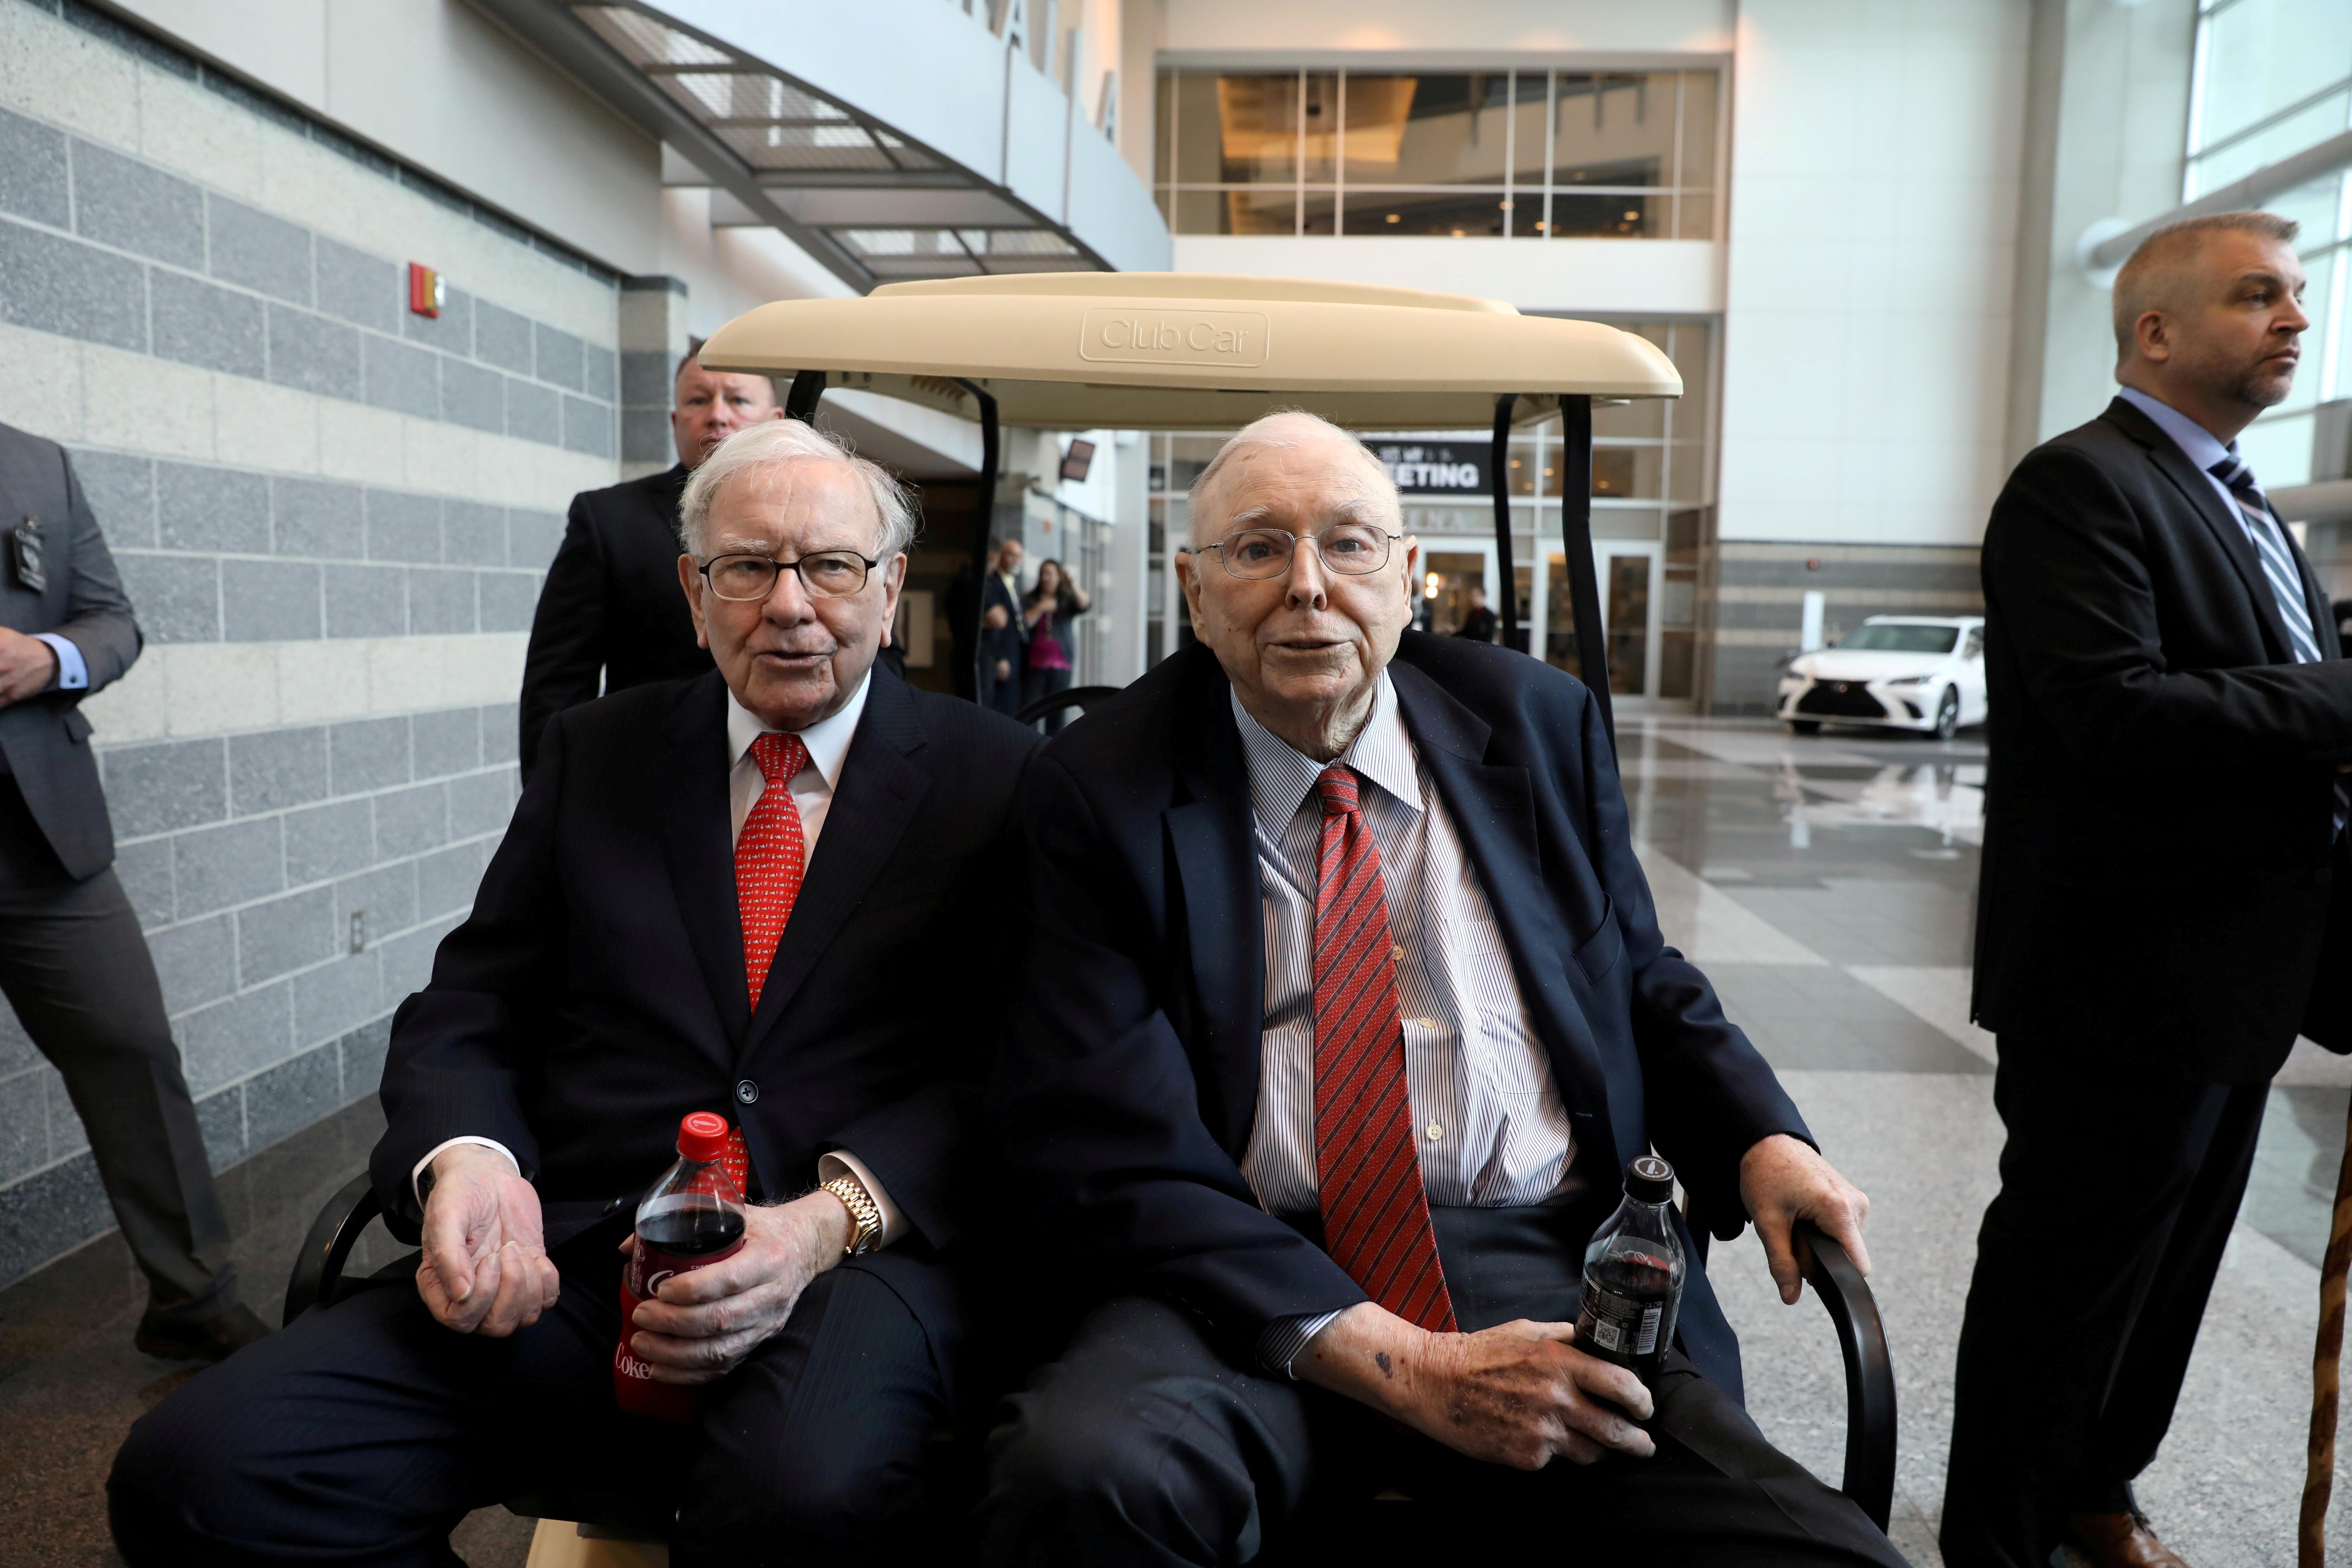 Berkshire Hathaway Chairman Warren Buffett (left) and Vice Chairman Charlie Munger are seen at the annual Berkshire shareholder shopping day in Omaha, Nebraska, U.S., May 3, 2019.   REUTERS/Scott Morgan